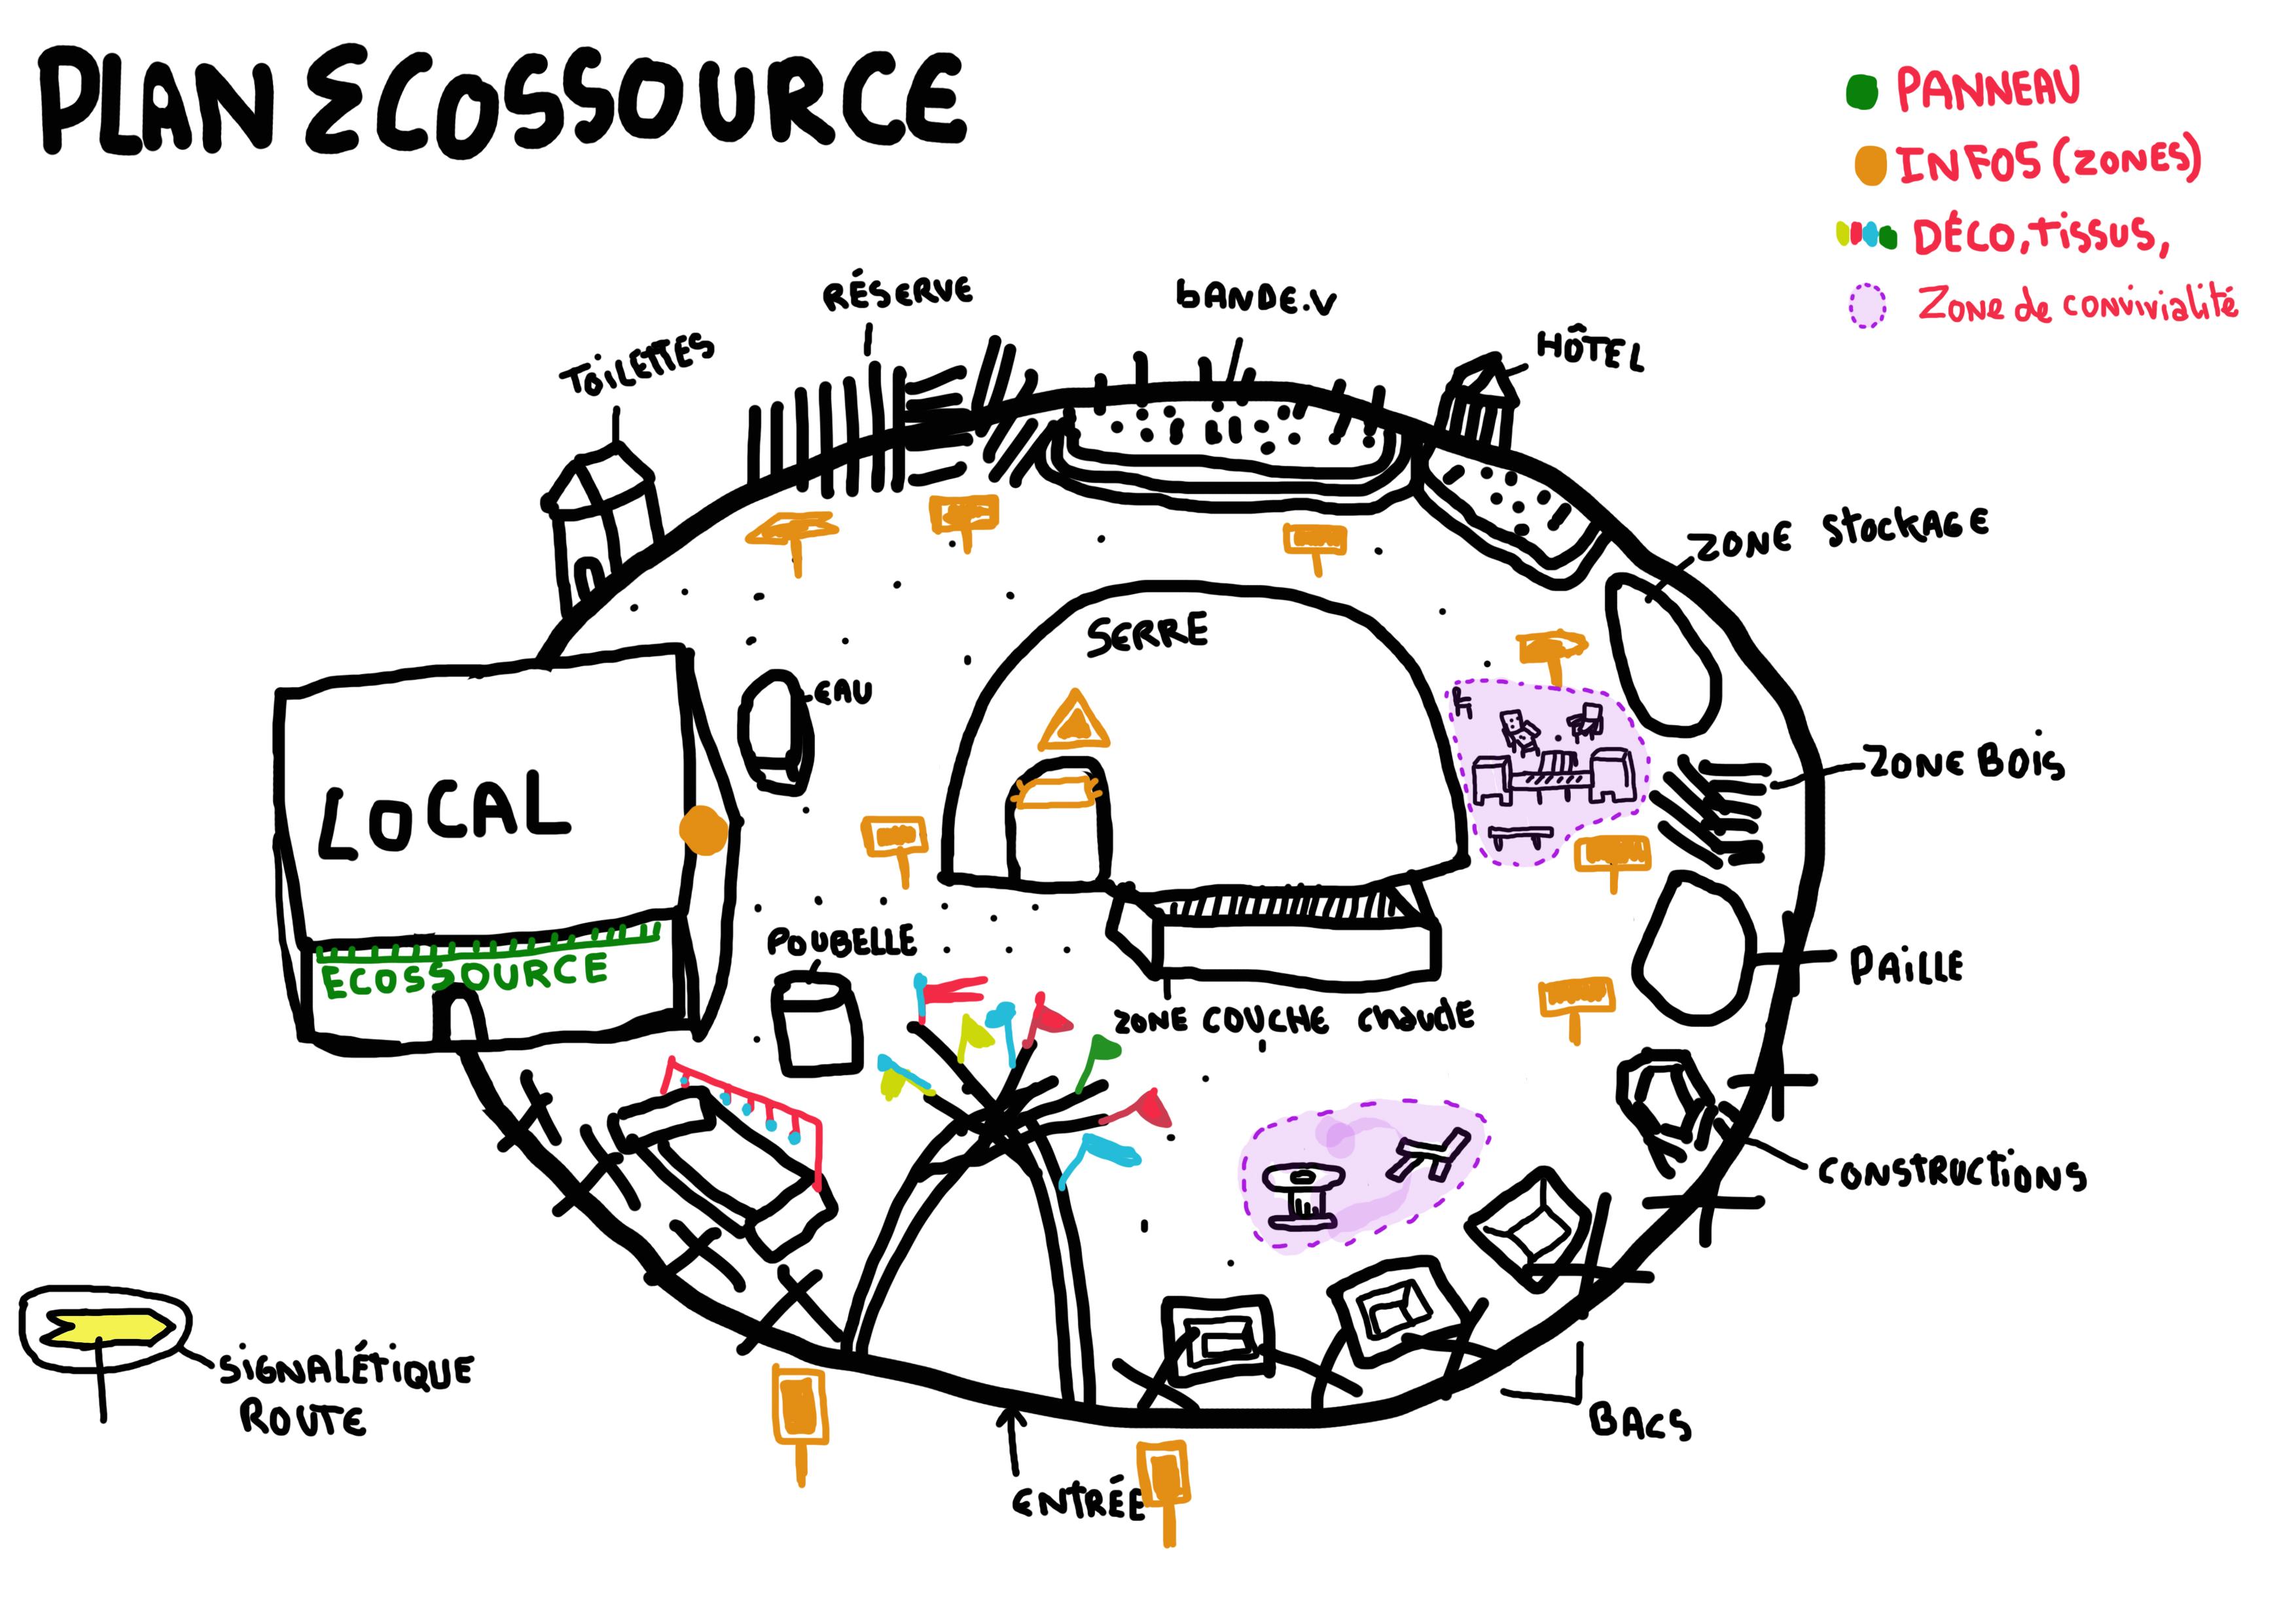 plan_ecossource.jpg